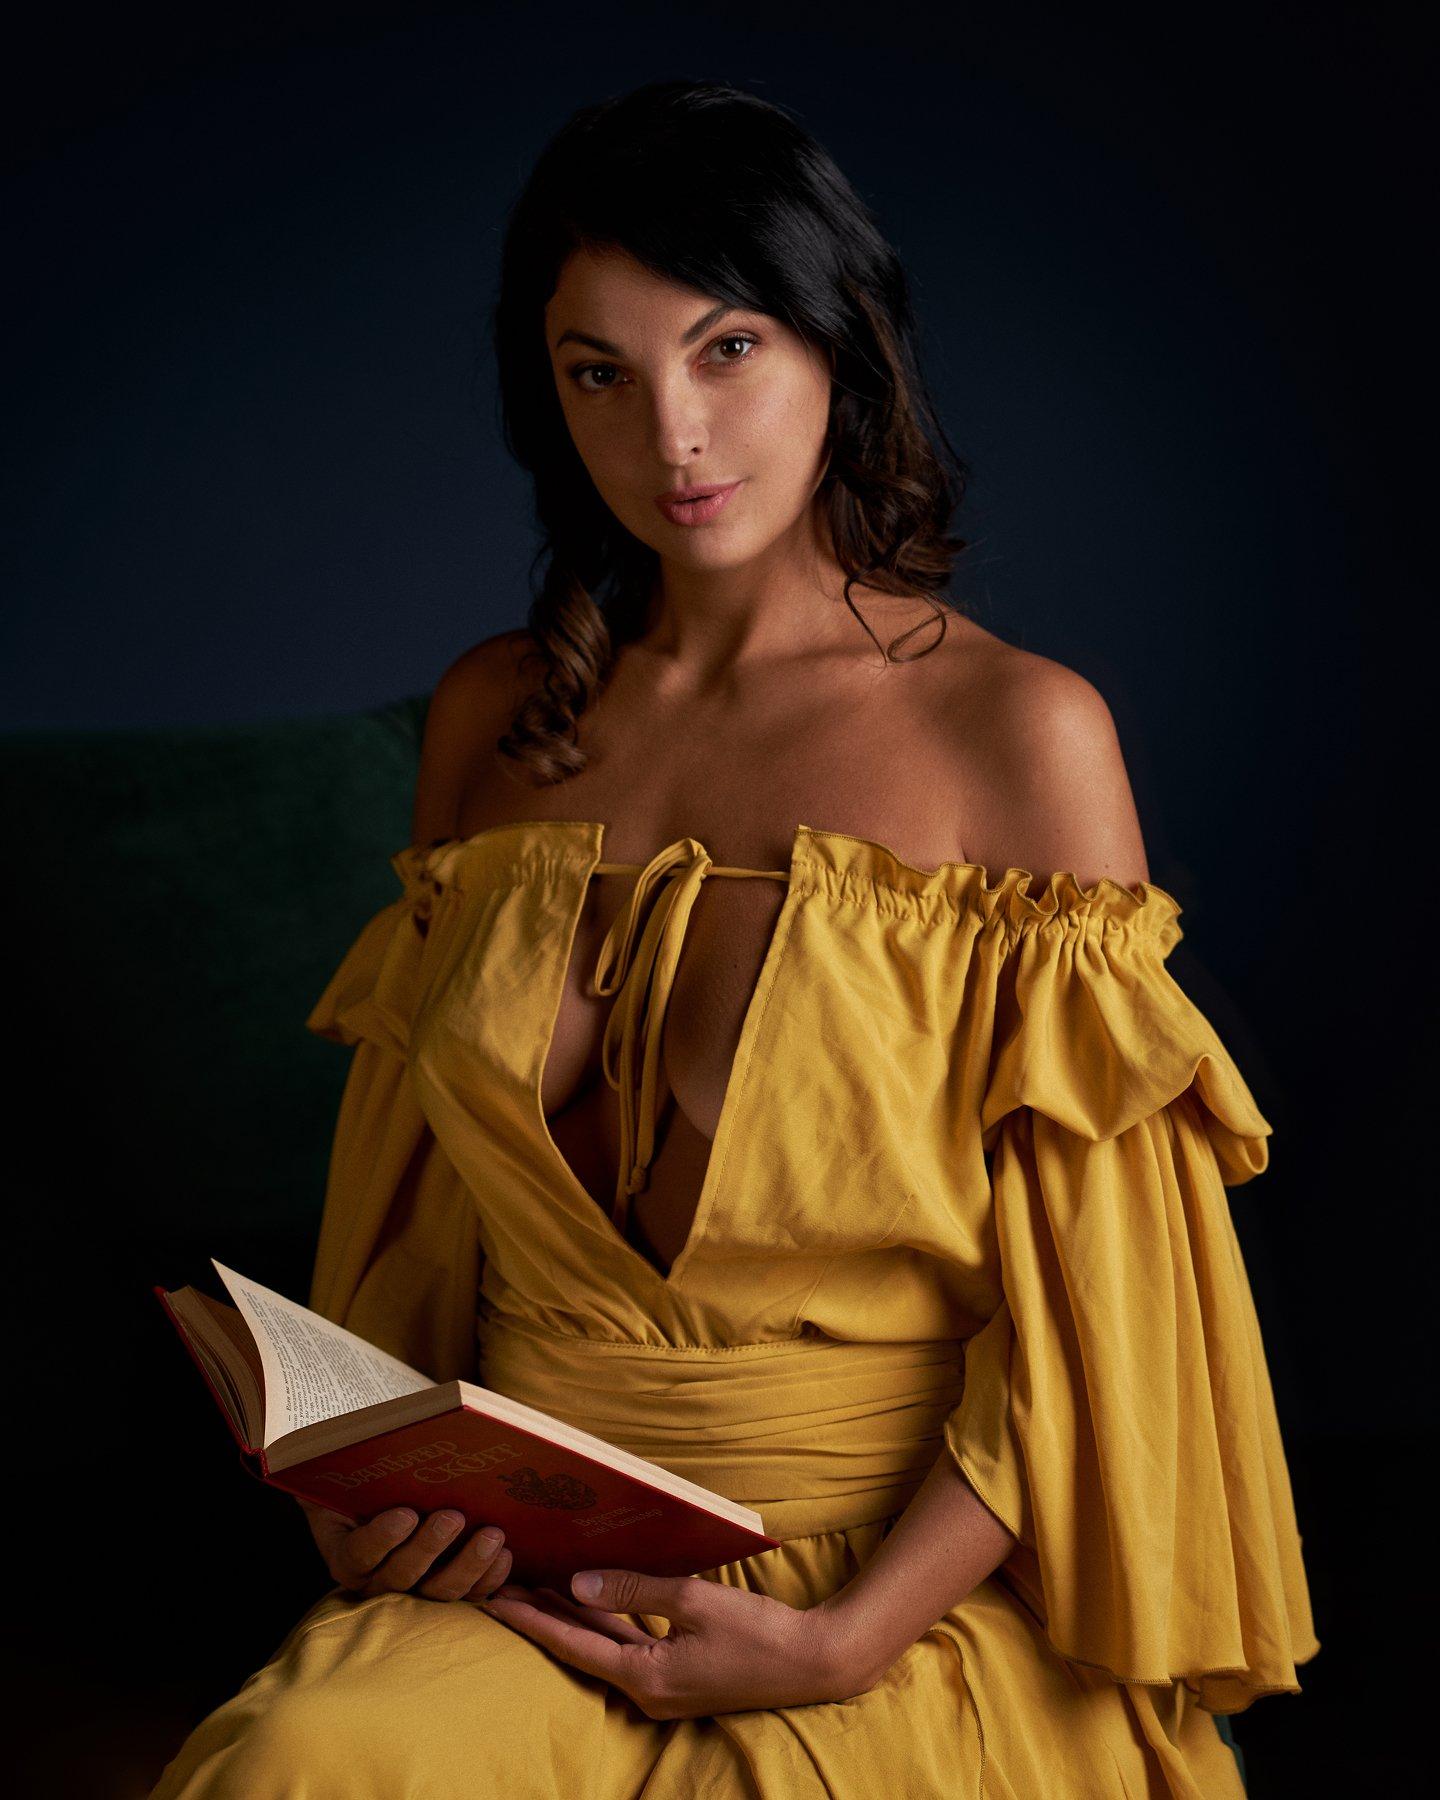 Порpyzhikphoto, портрет, классика, классический портрет, портрет девушки, женский портрет, portrait, classic, art, красавицатрет, Пыжик Максим